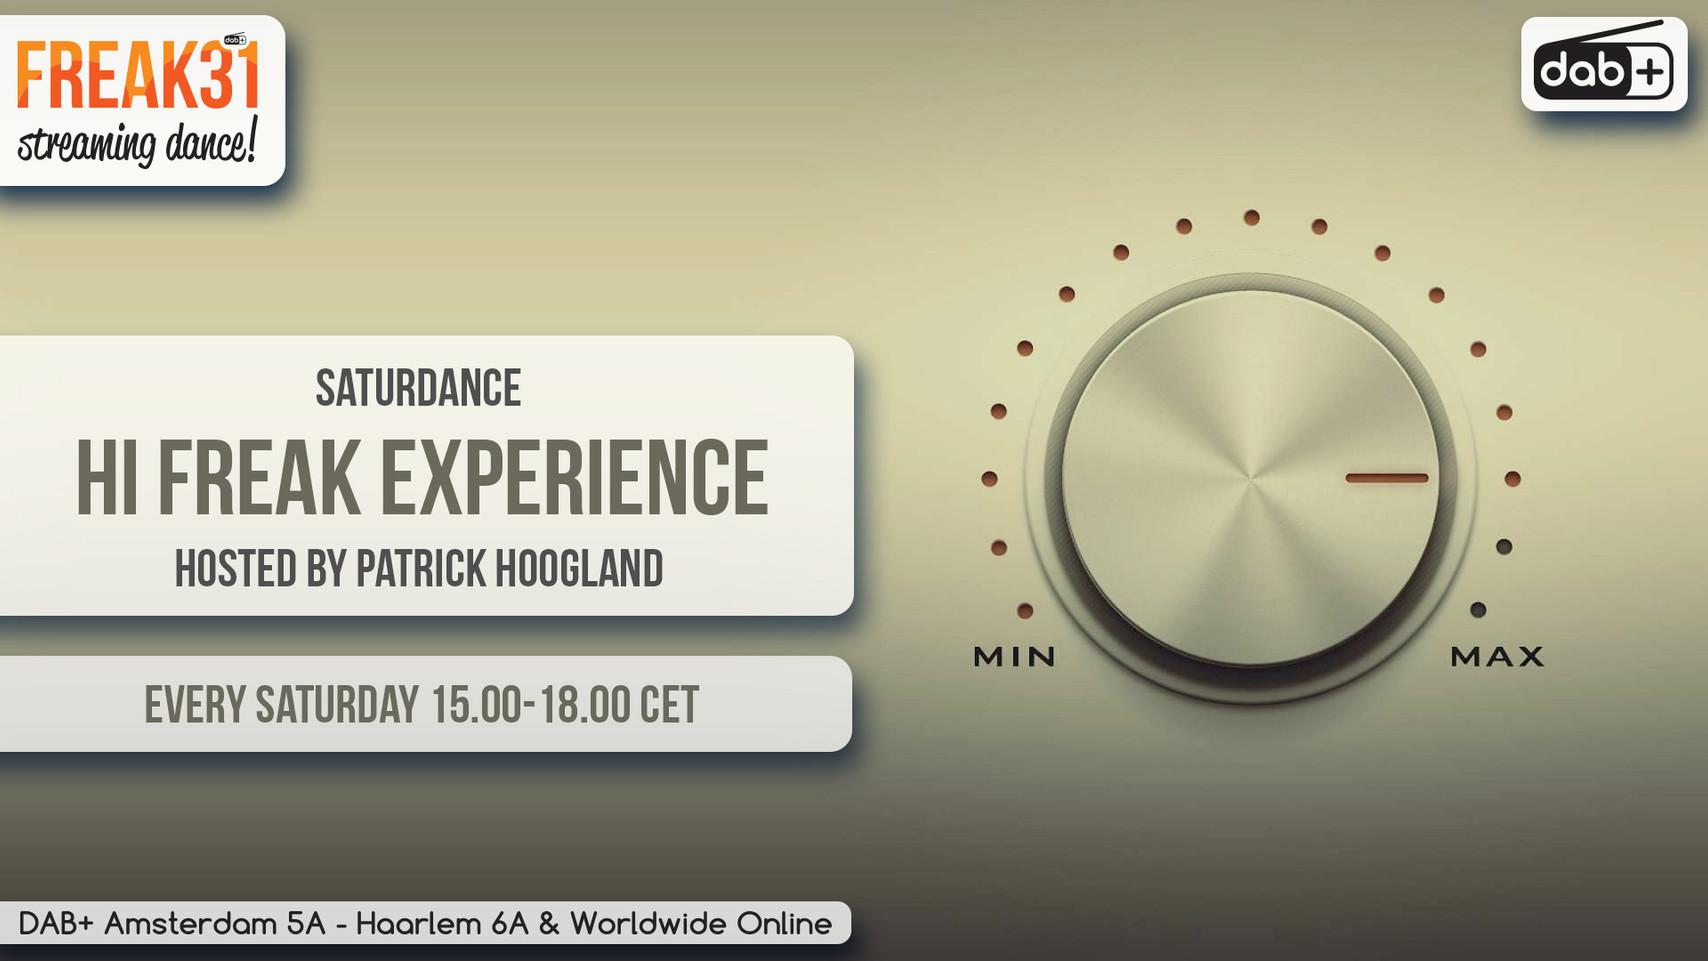 Patrick Hoogland - High Freak Experience